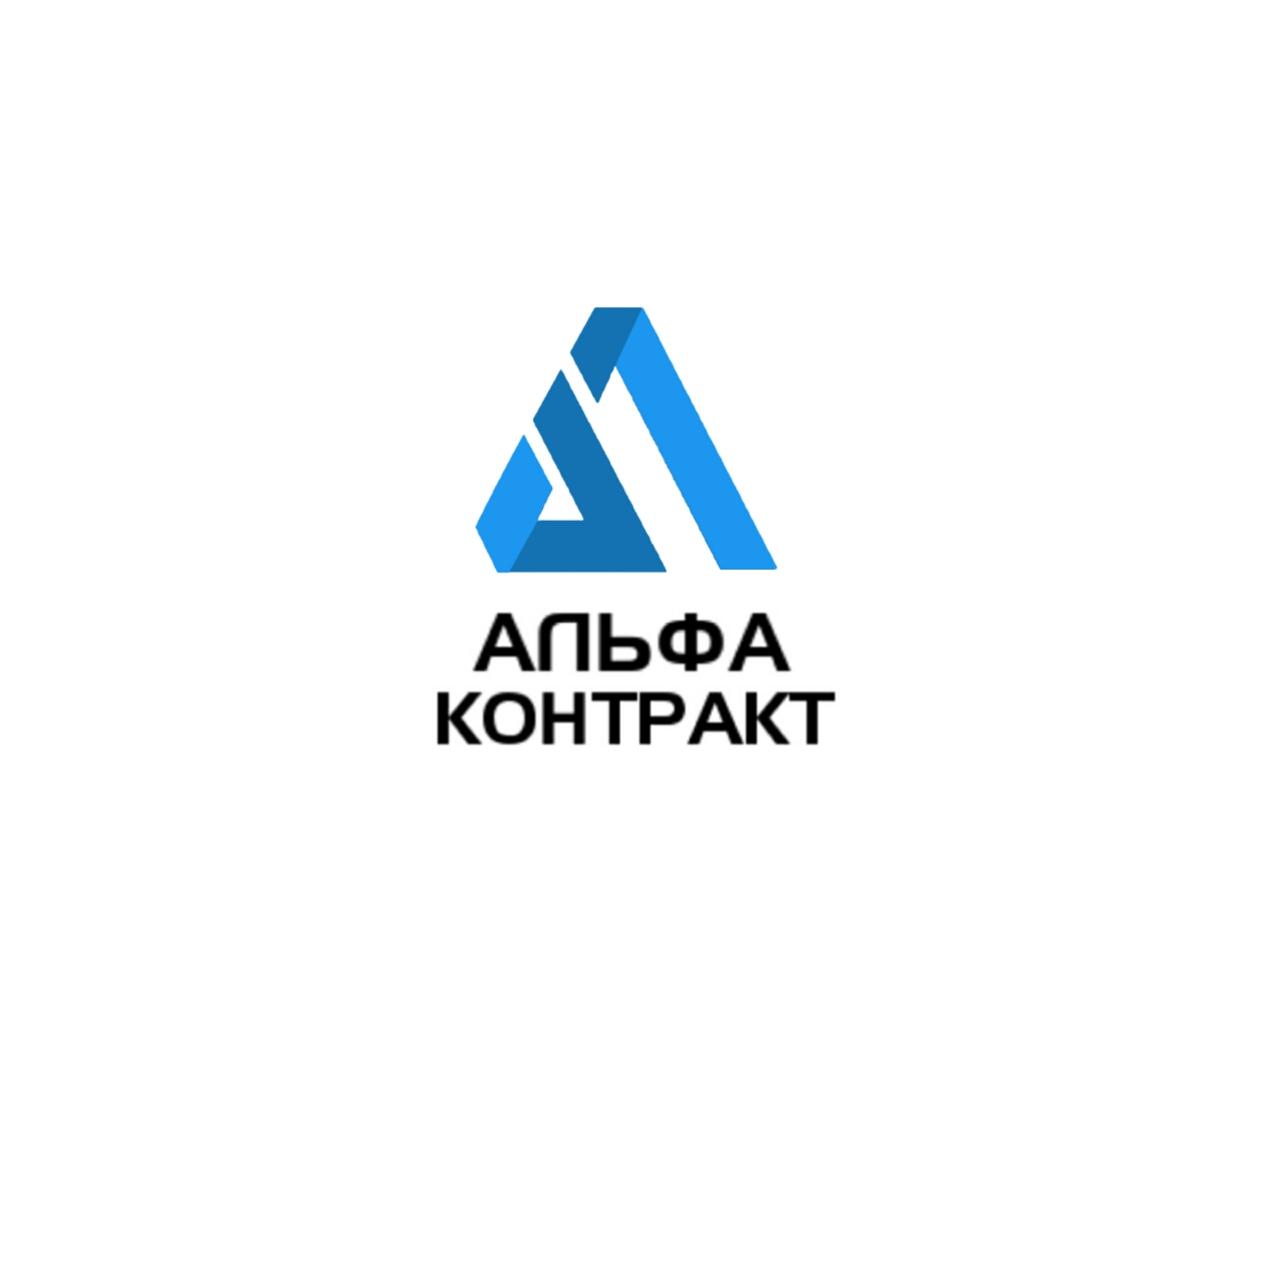 Дизайнер для разработки логотипа компании фото f_0755bf9395bb8d09.jpg